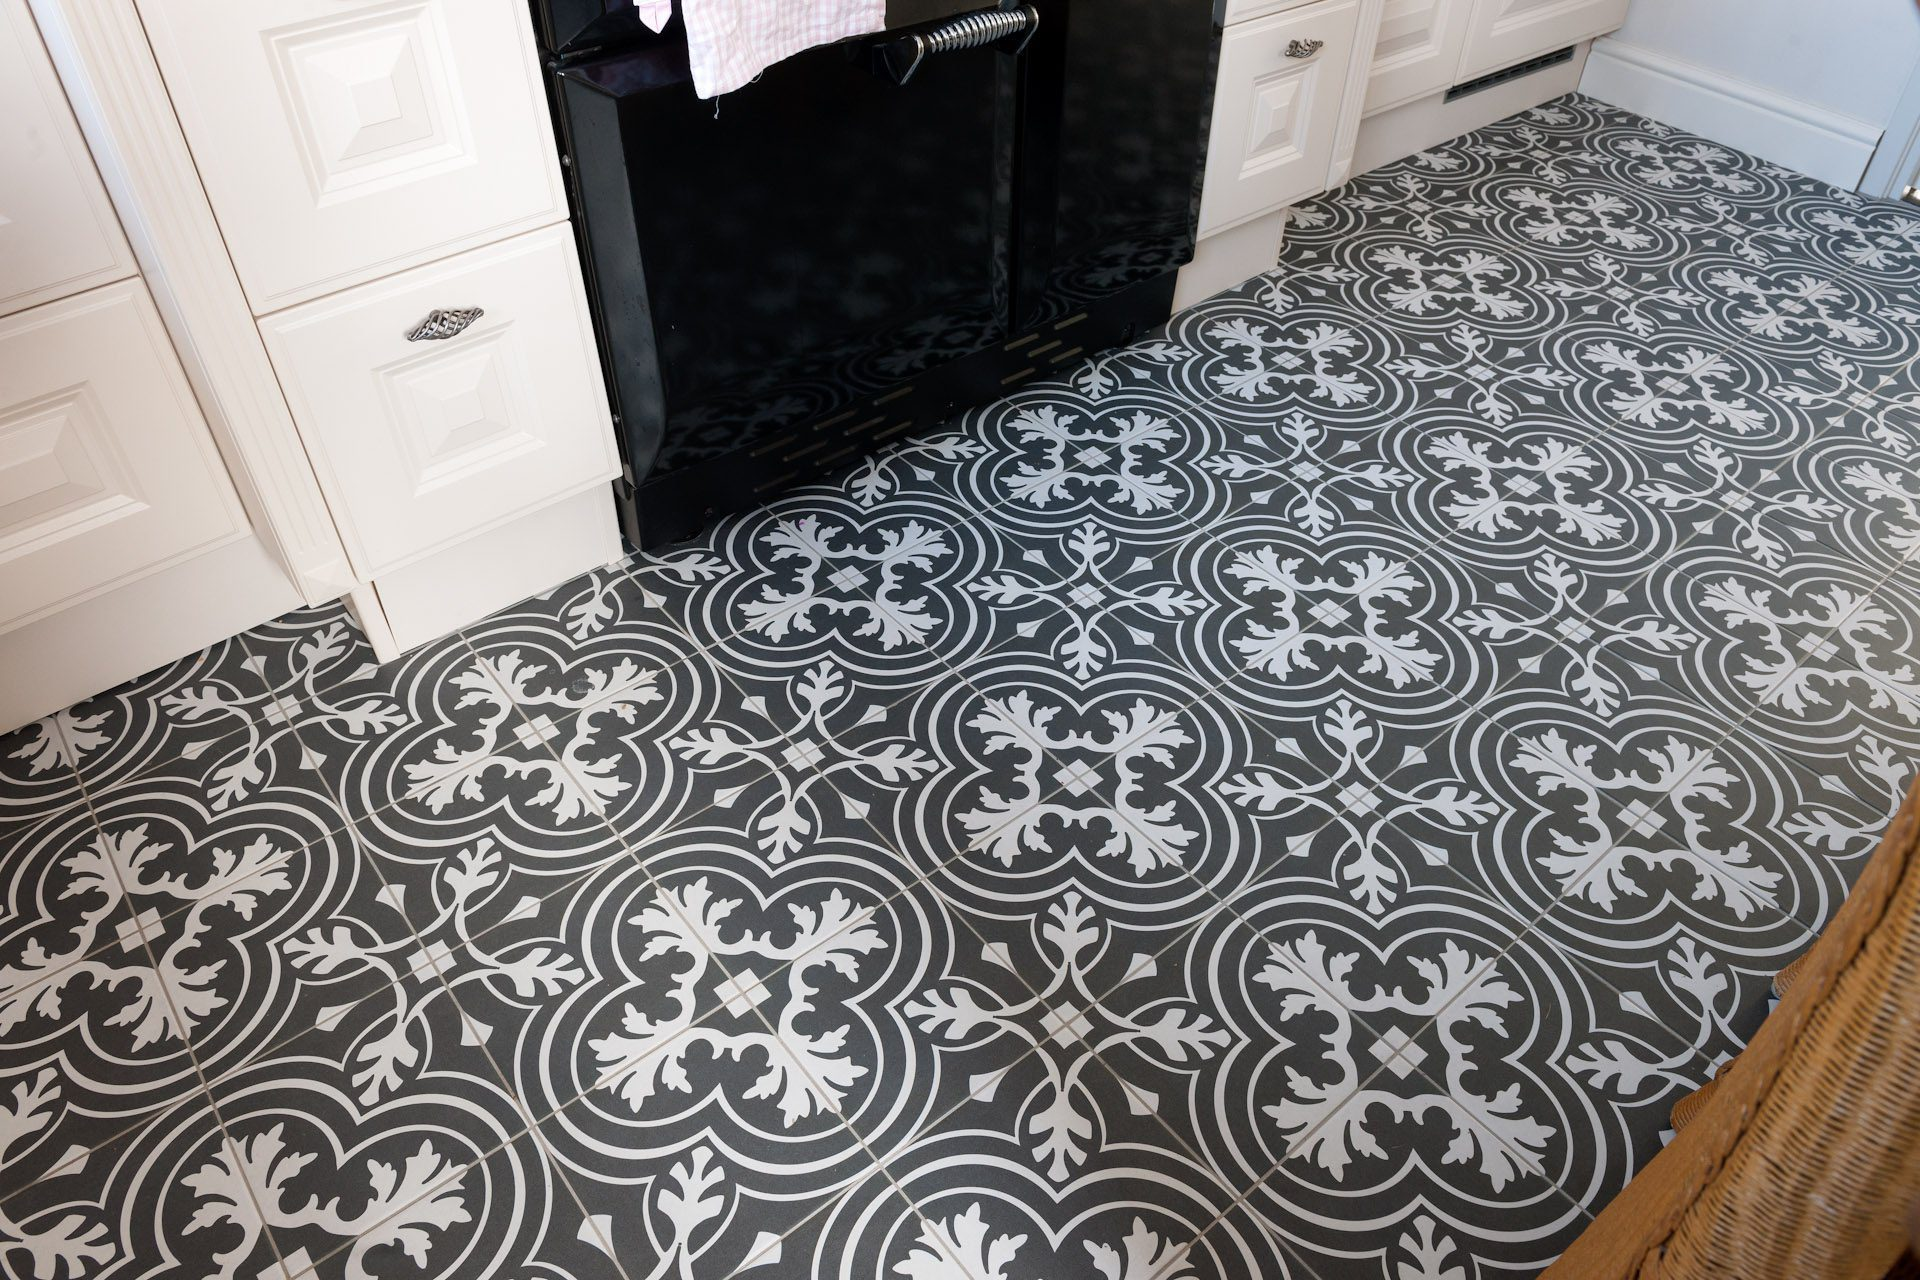 Houtlook vloer in woonkamer donkere patroontegels in keuken - Tegelvloer patroon ...